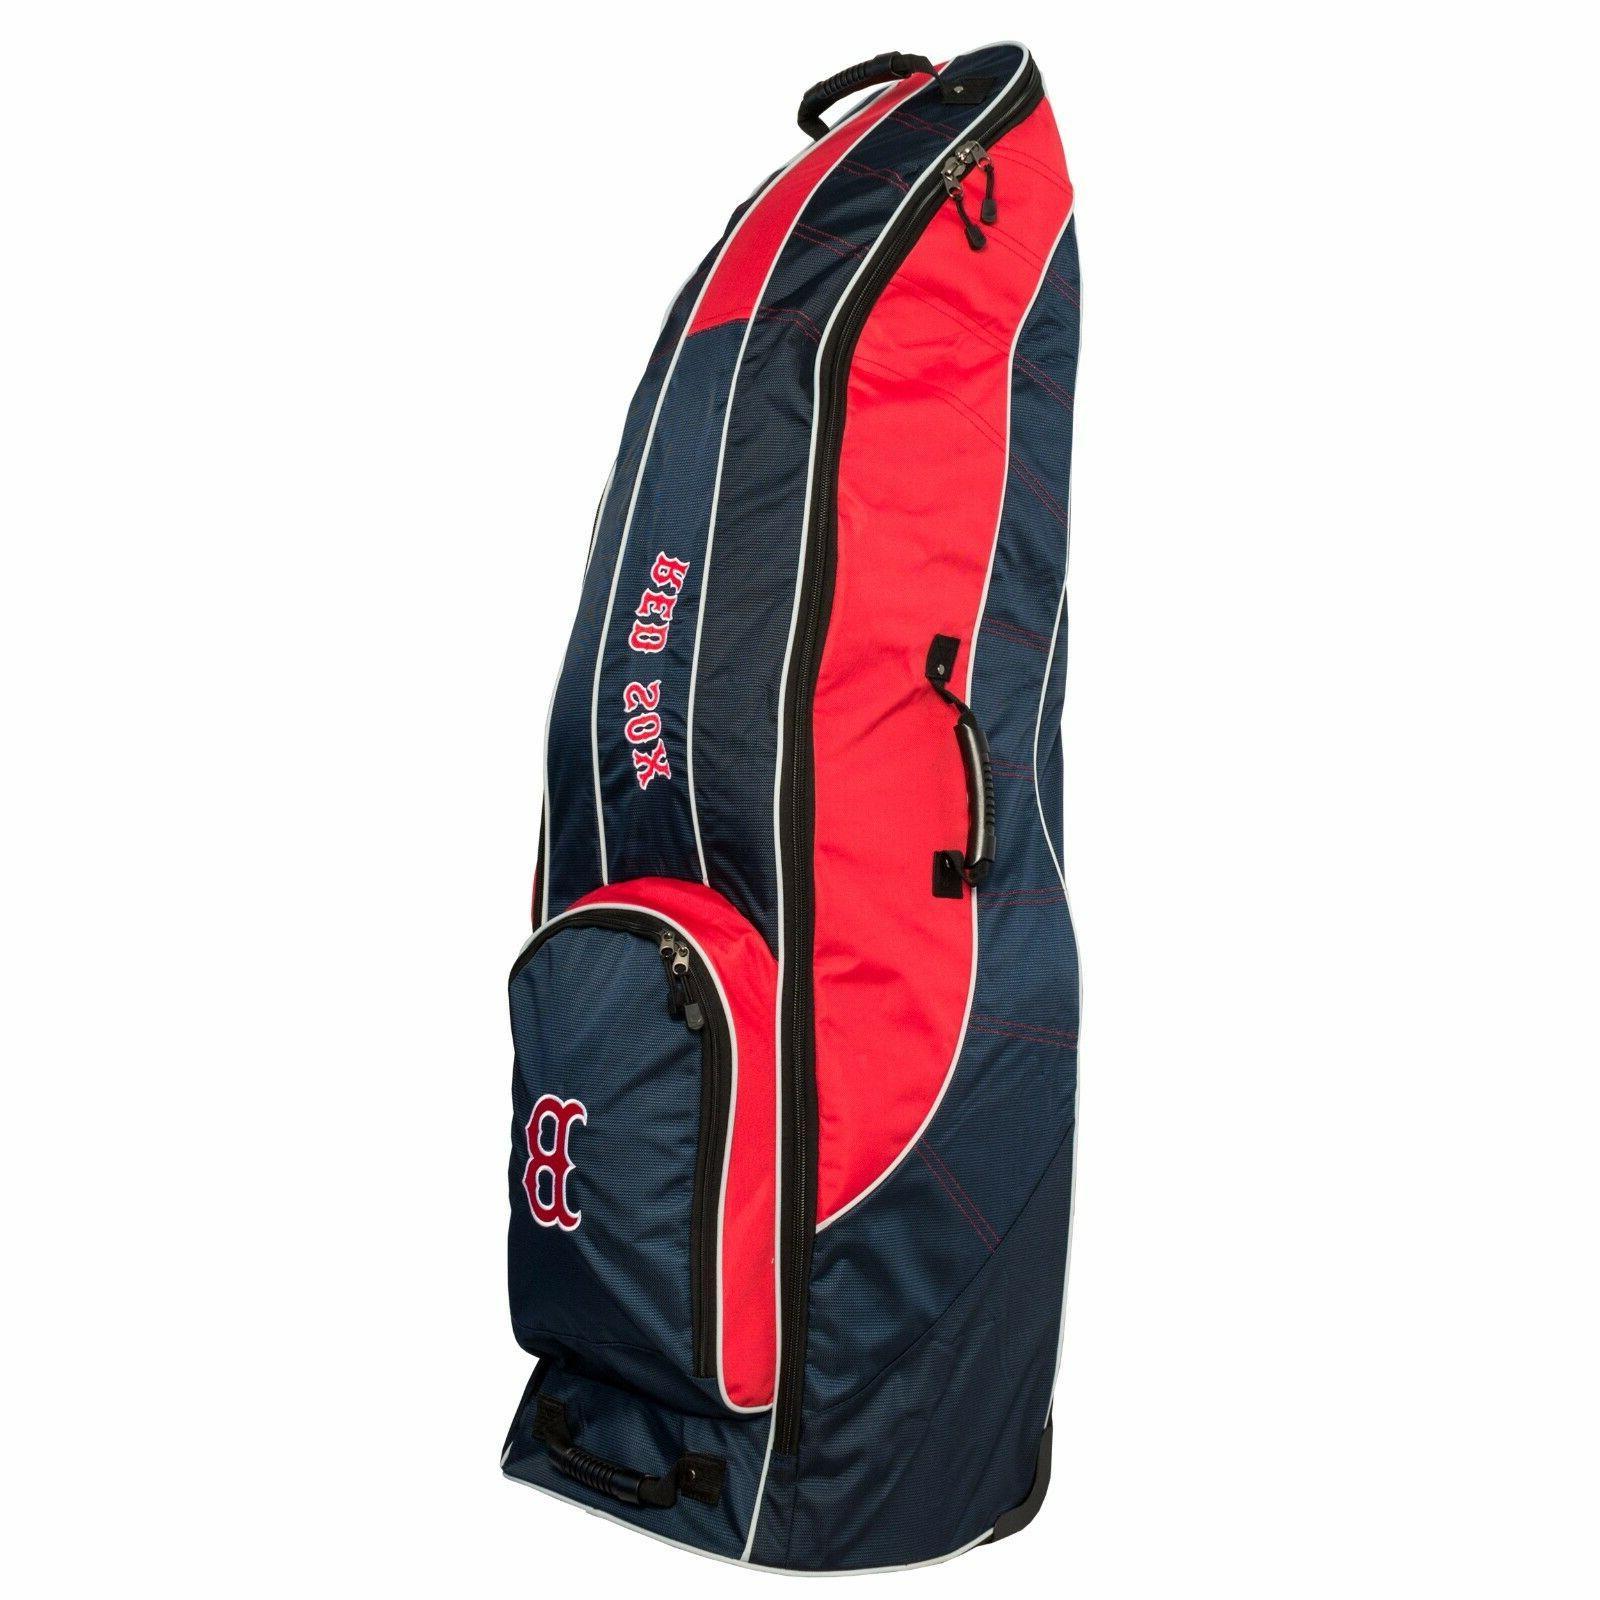 New Team Golf Boston Red Sox Golf Bag Travel Cover